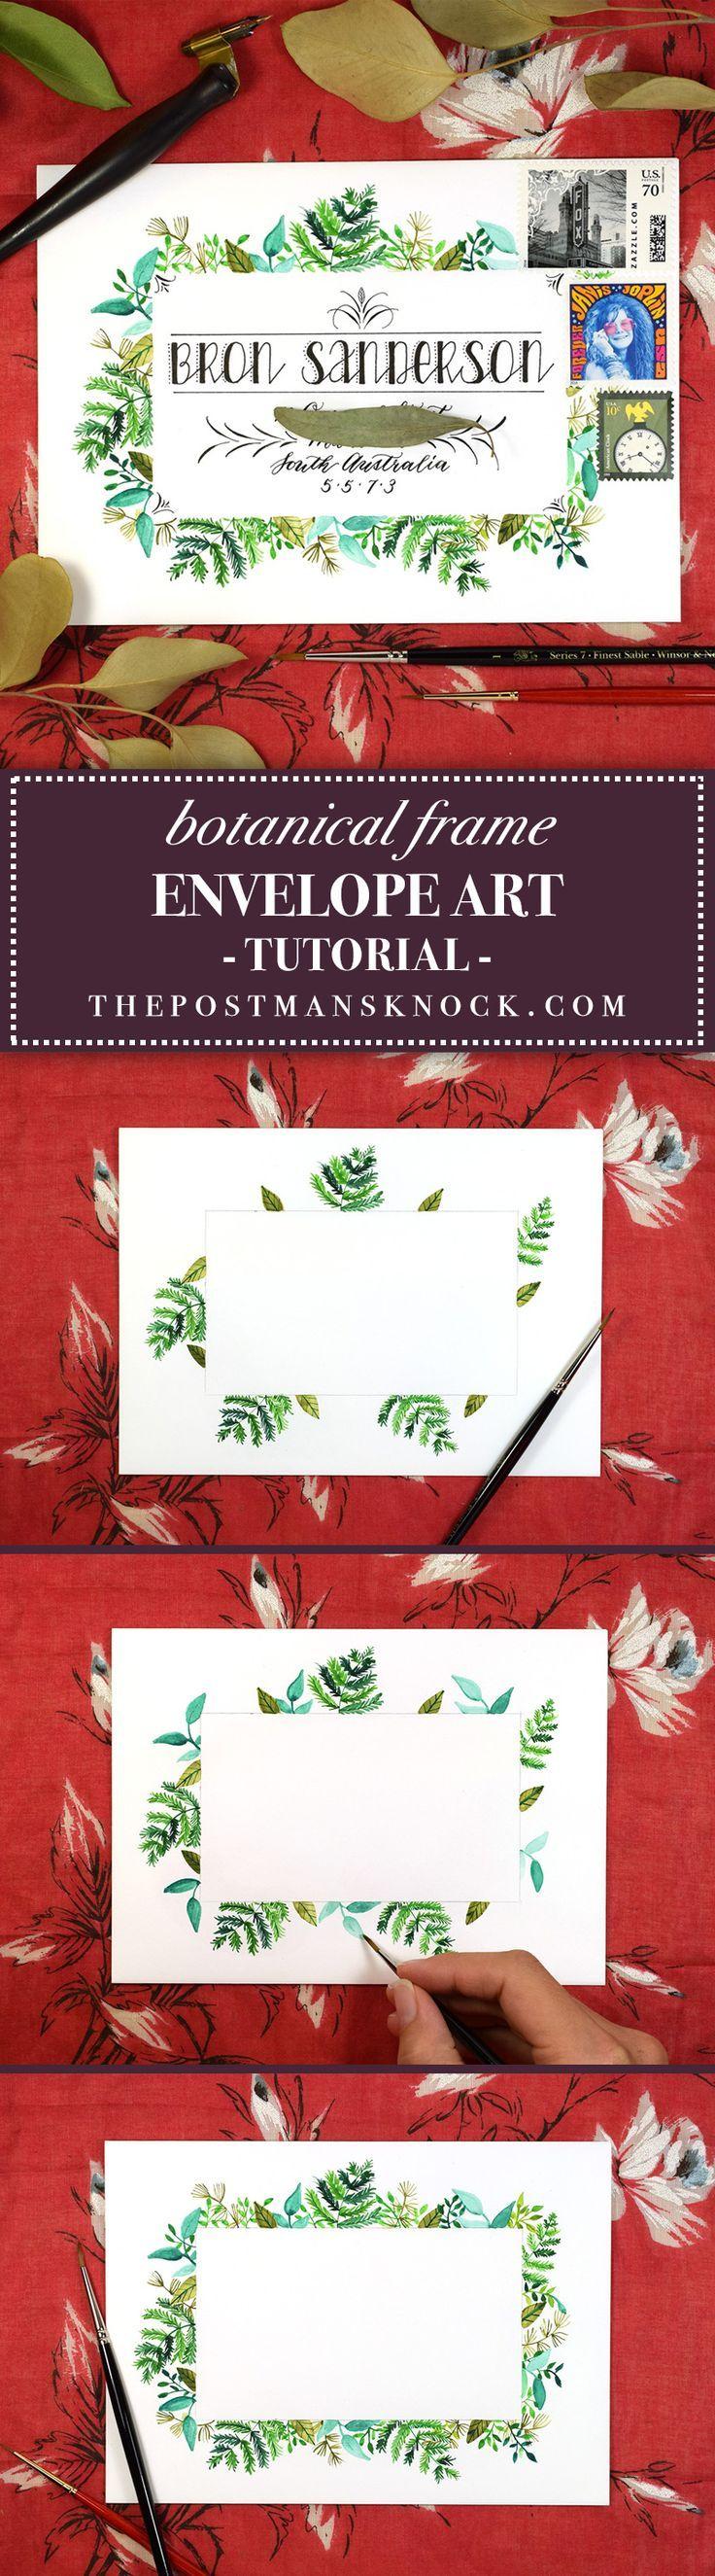 539 best Pushing the Envelope images on Pinterest   Envelopes ...